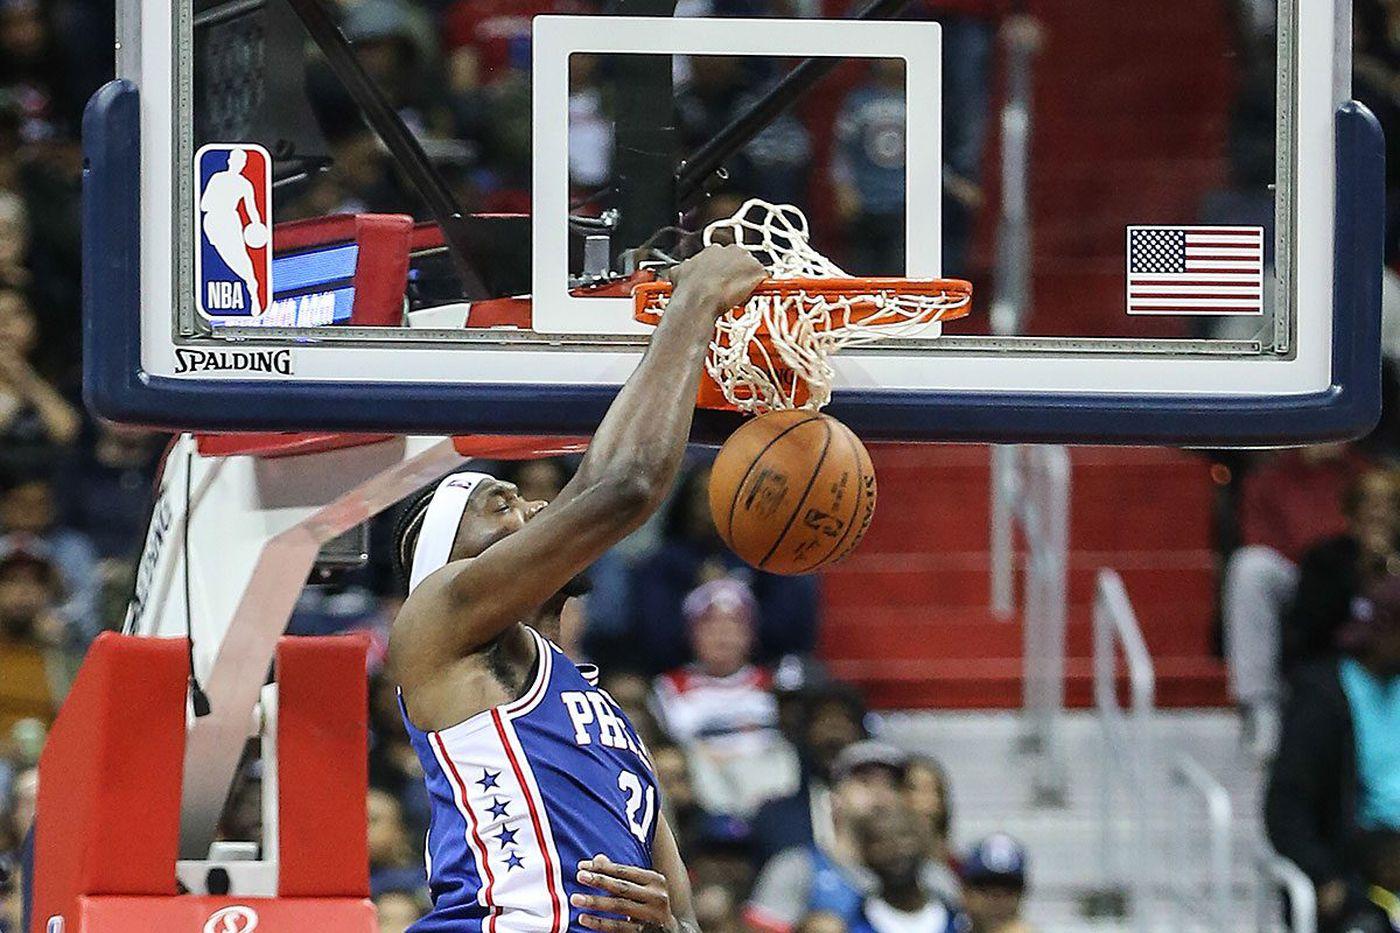 Sixers vs. Houston Rockets - live updates